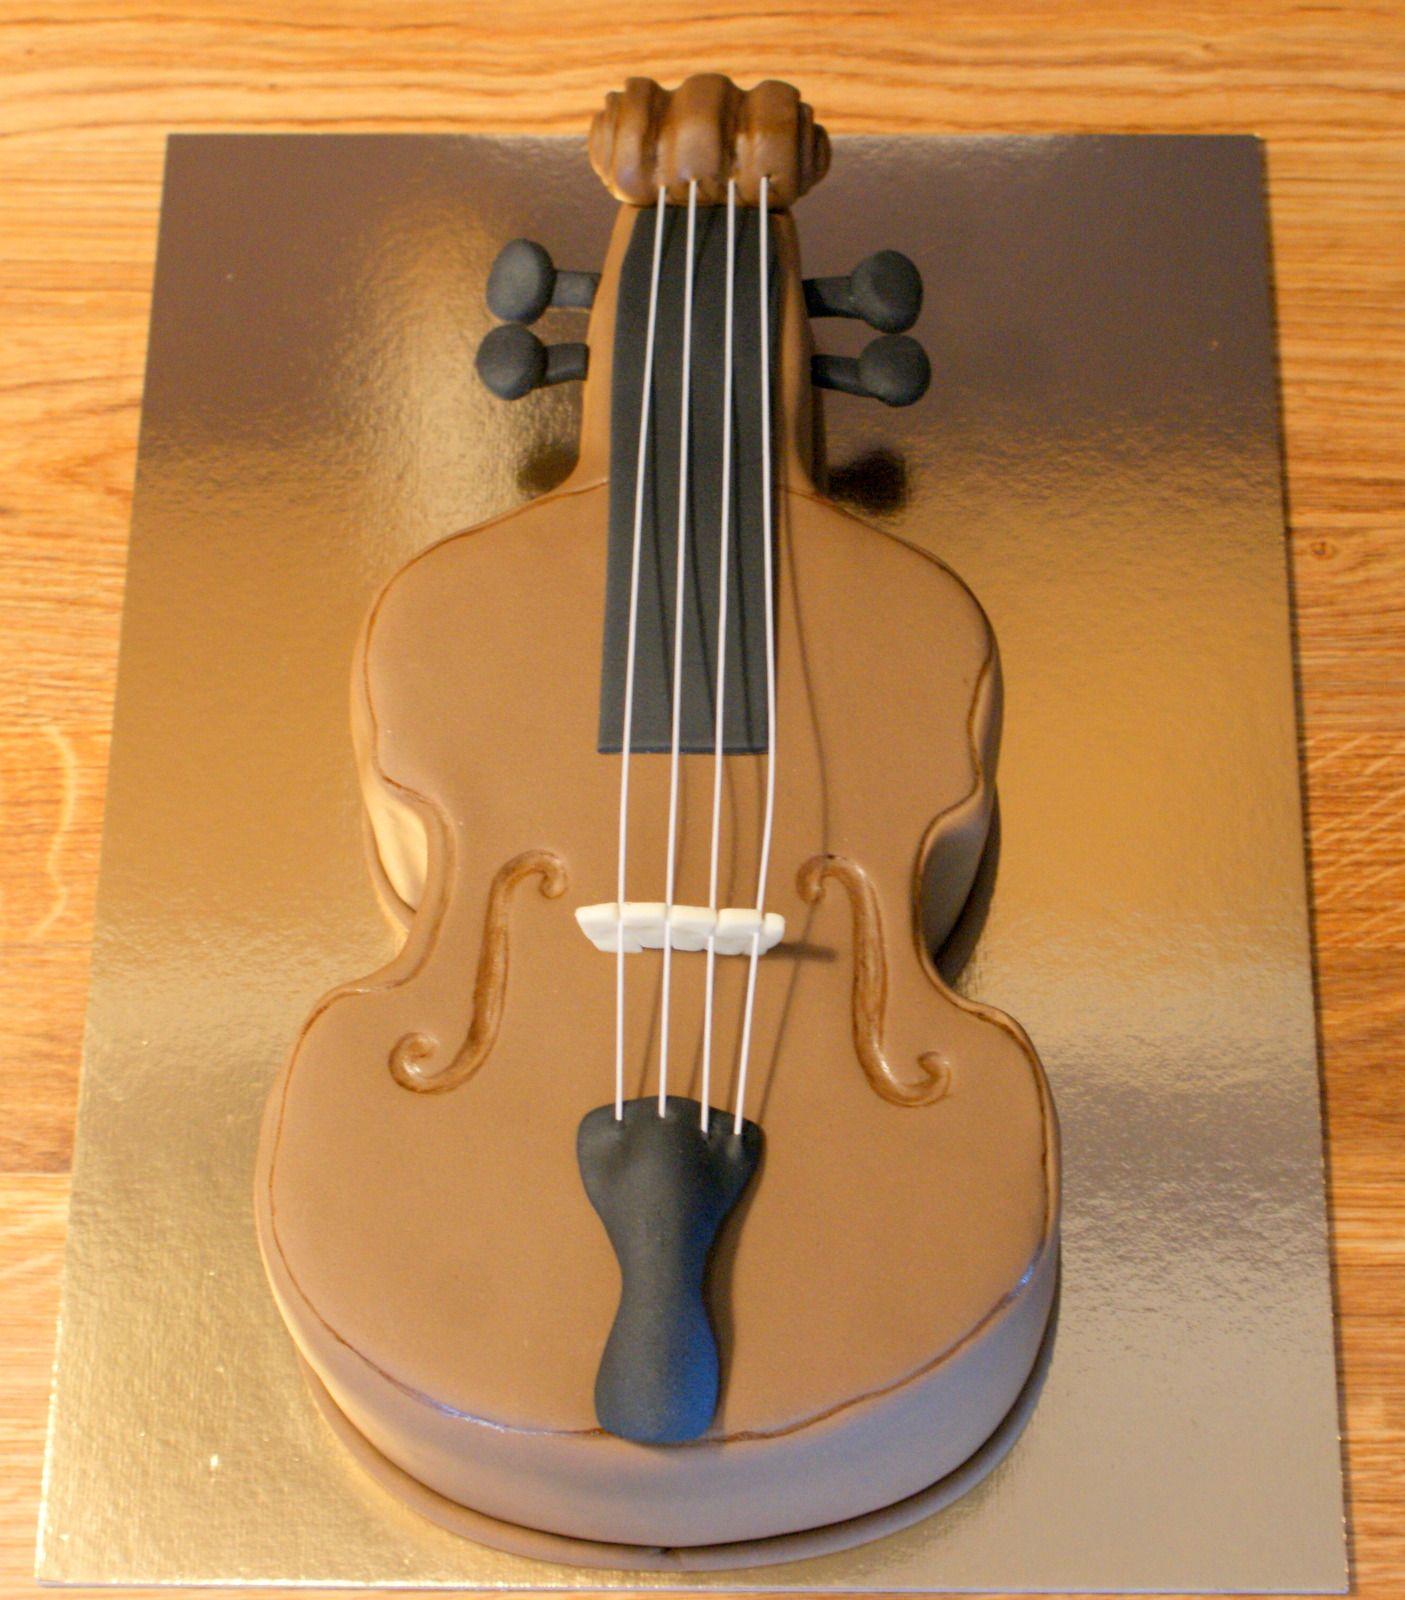 How To Make A Violin Shaped Cake